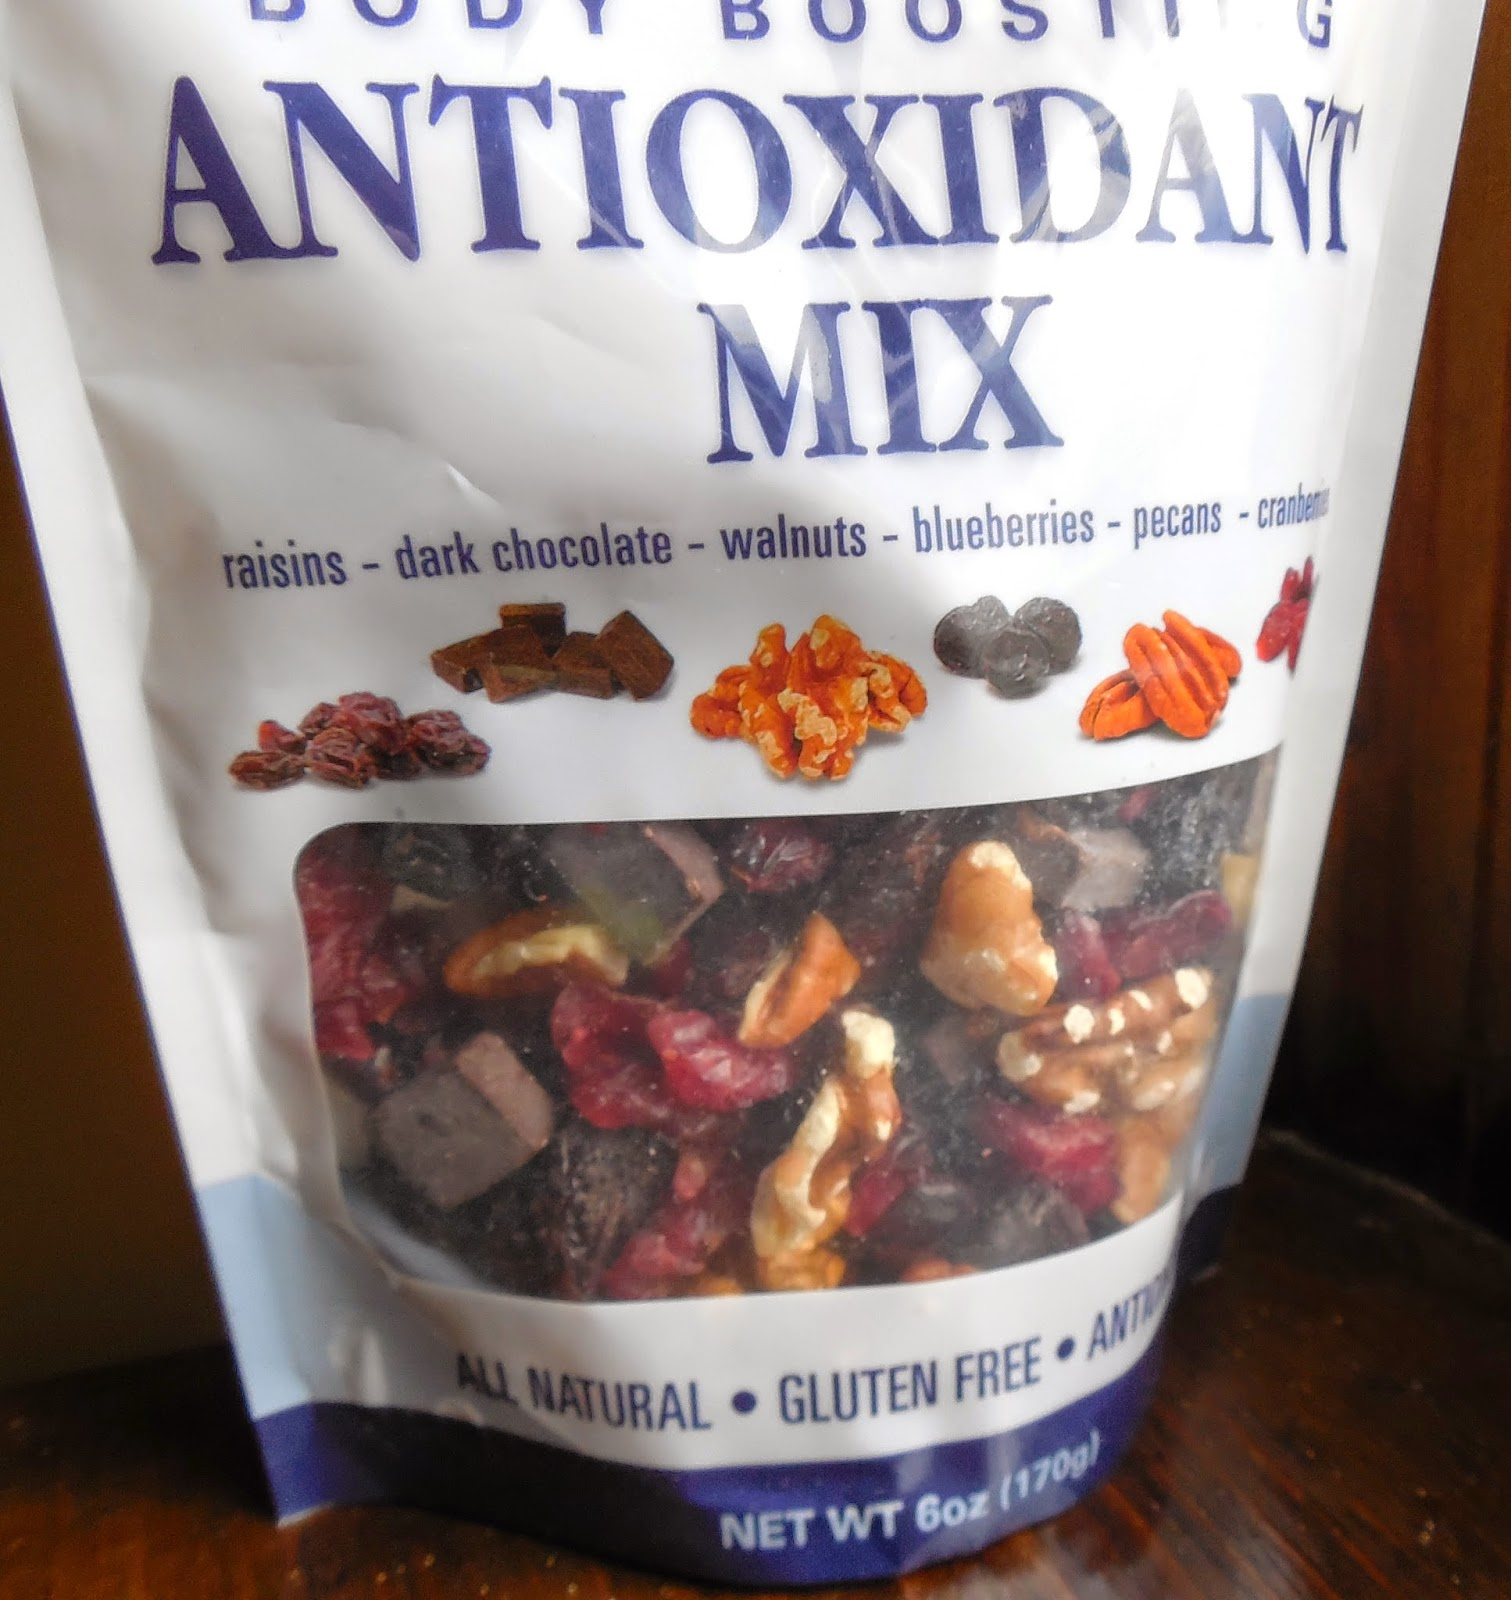 Gourmet Nut Antioxidant Mix